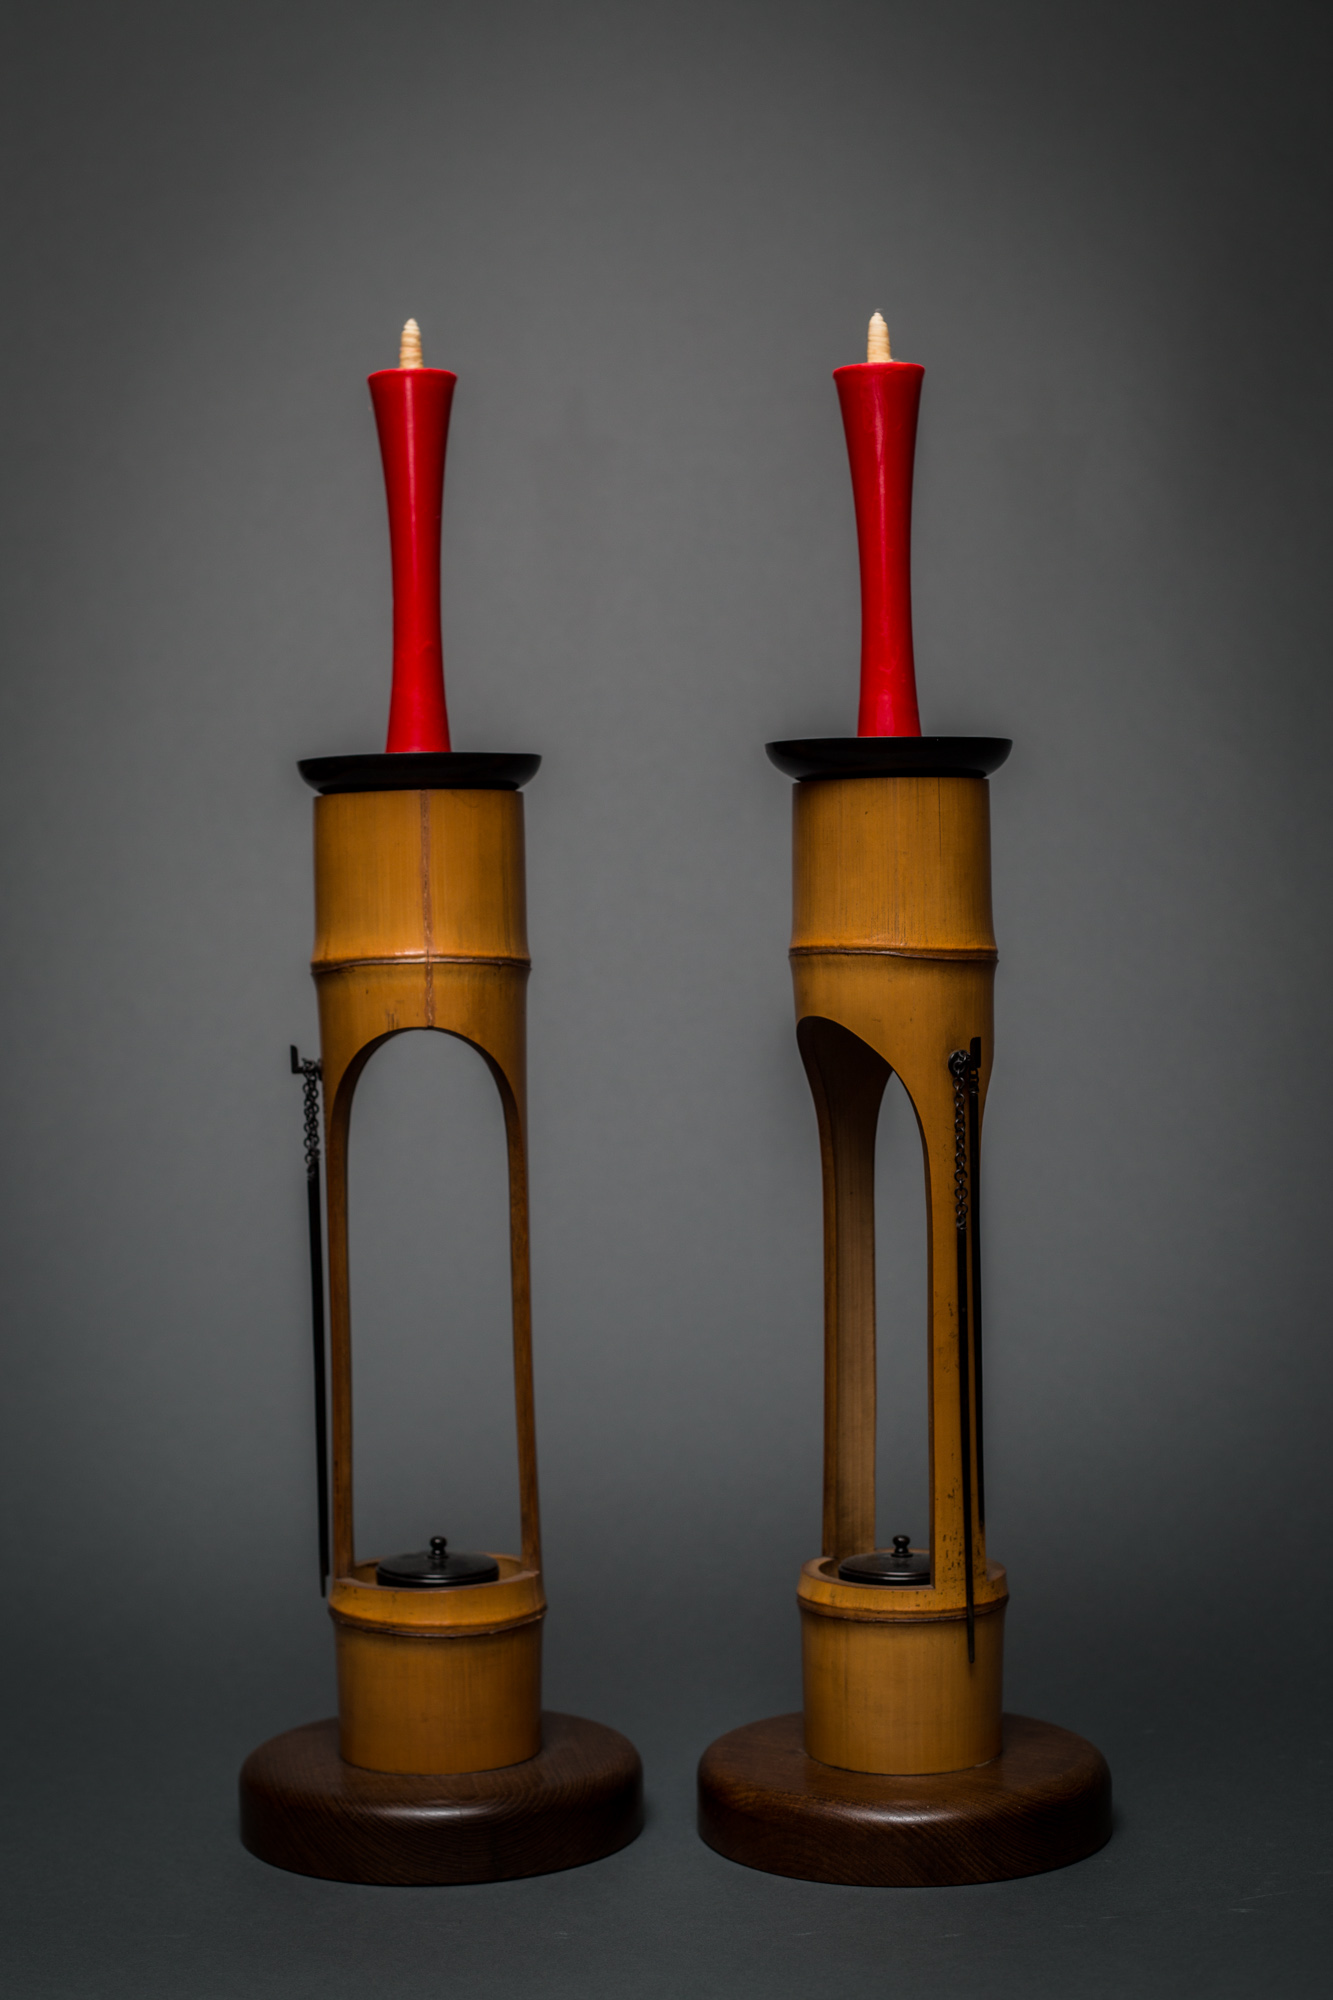 Pair of Japanese Bamboo Candlesticks